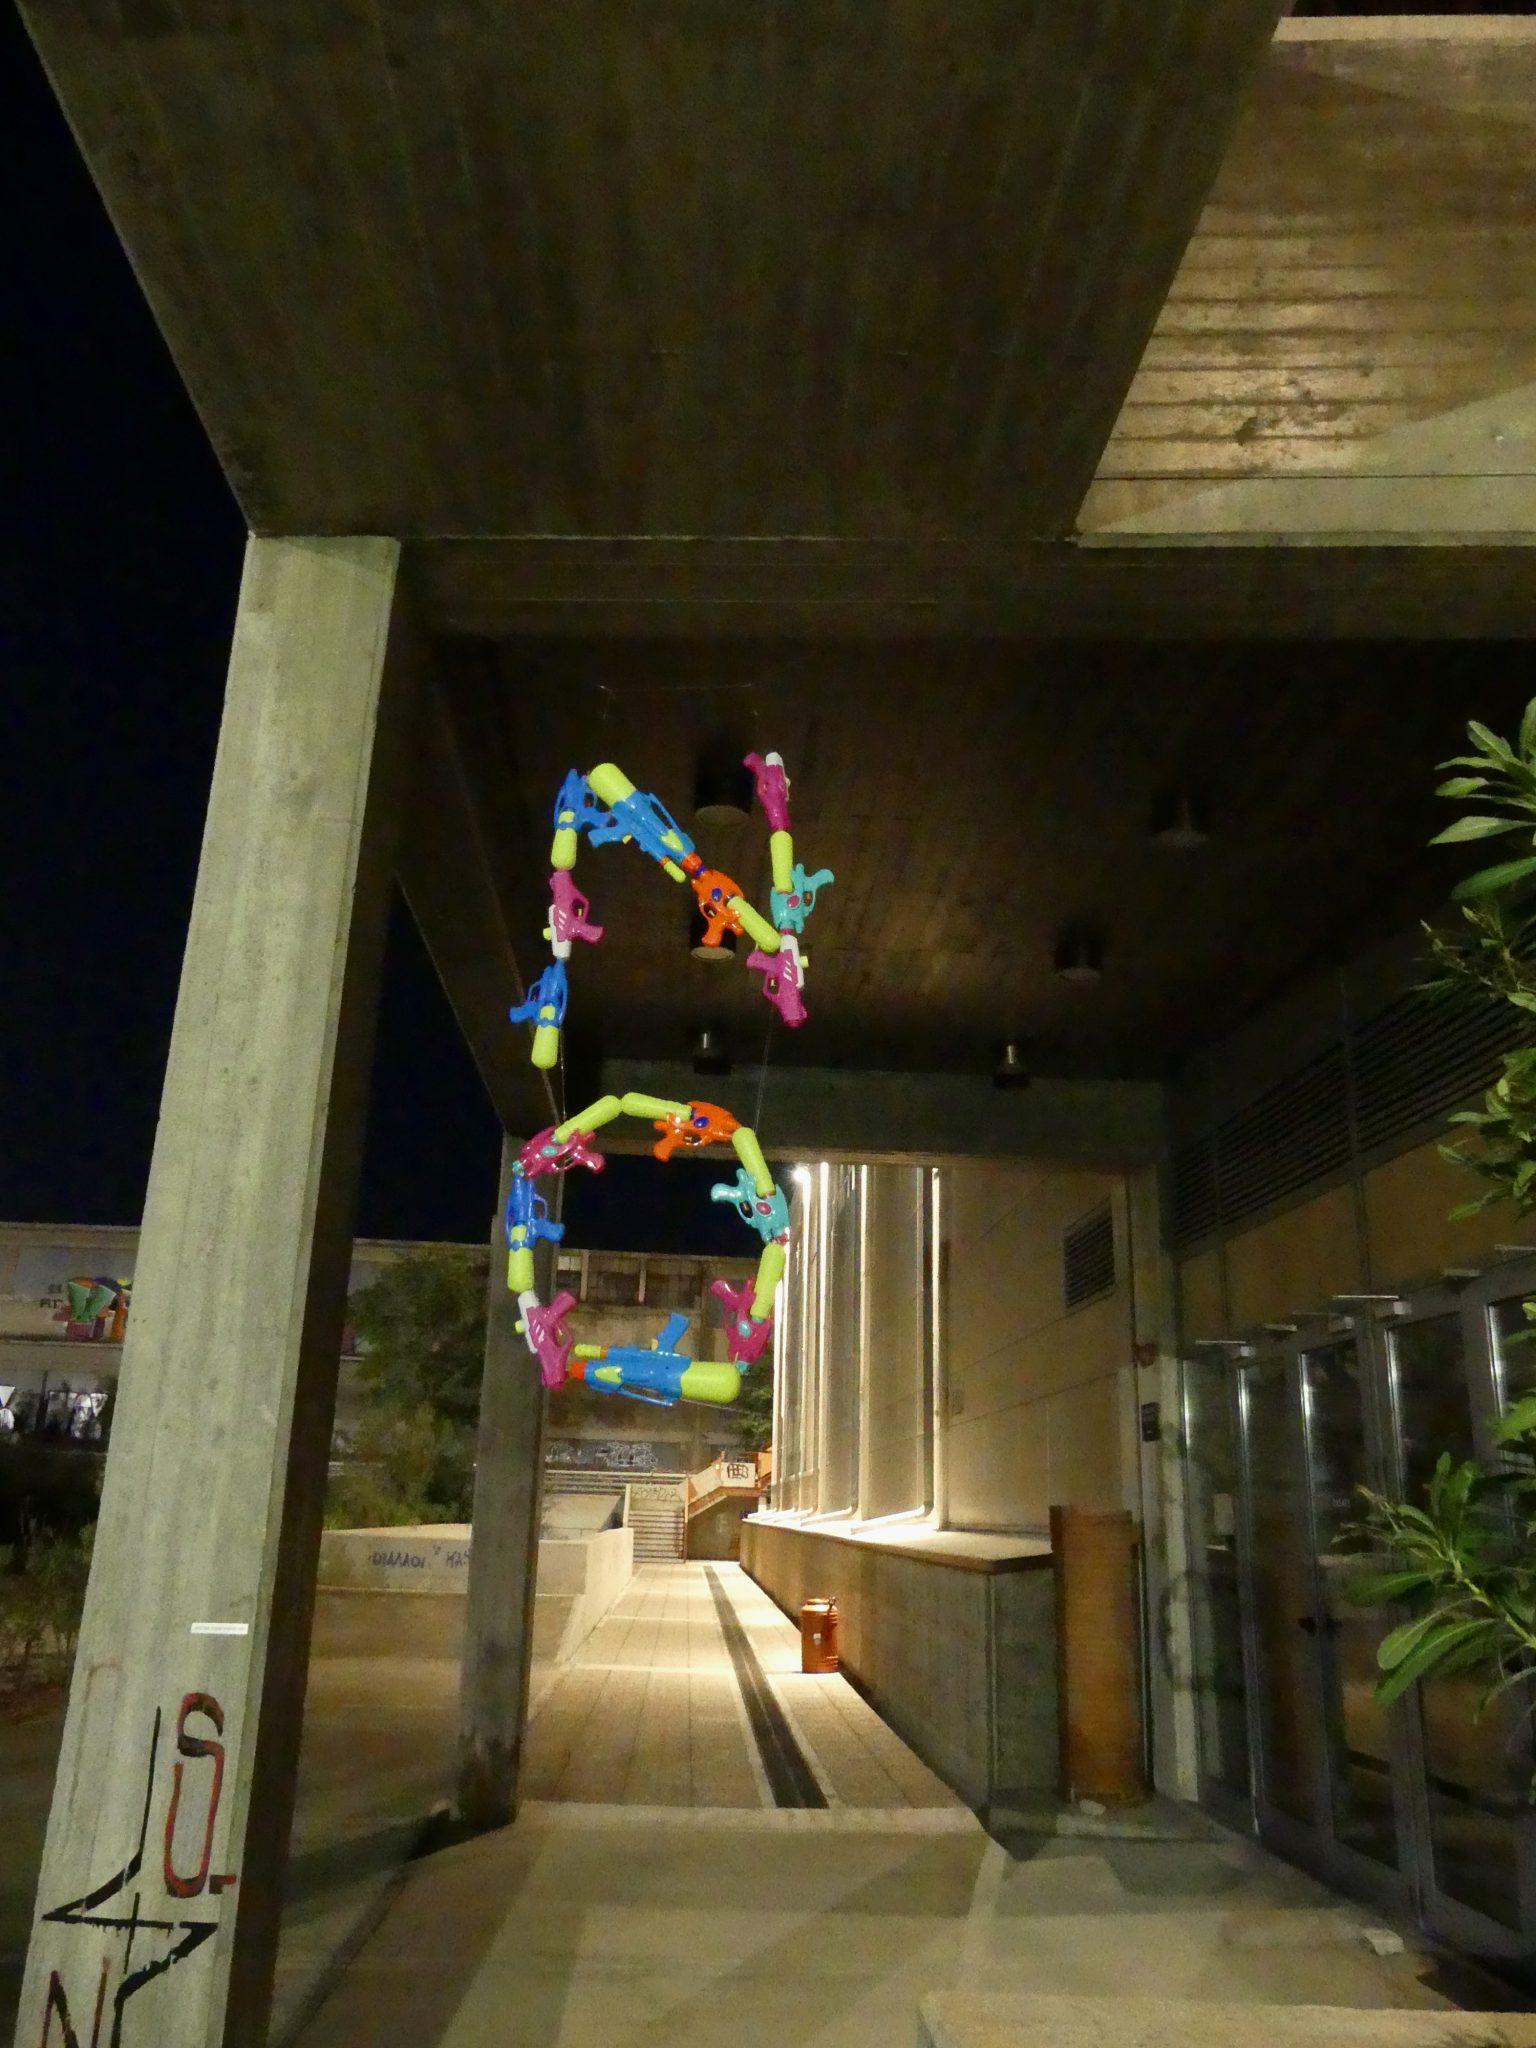 tidal flow art rubick's cube κύβος του Ρούμπικ ΑΣΚΤ ASFA 9